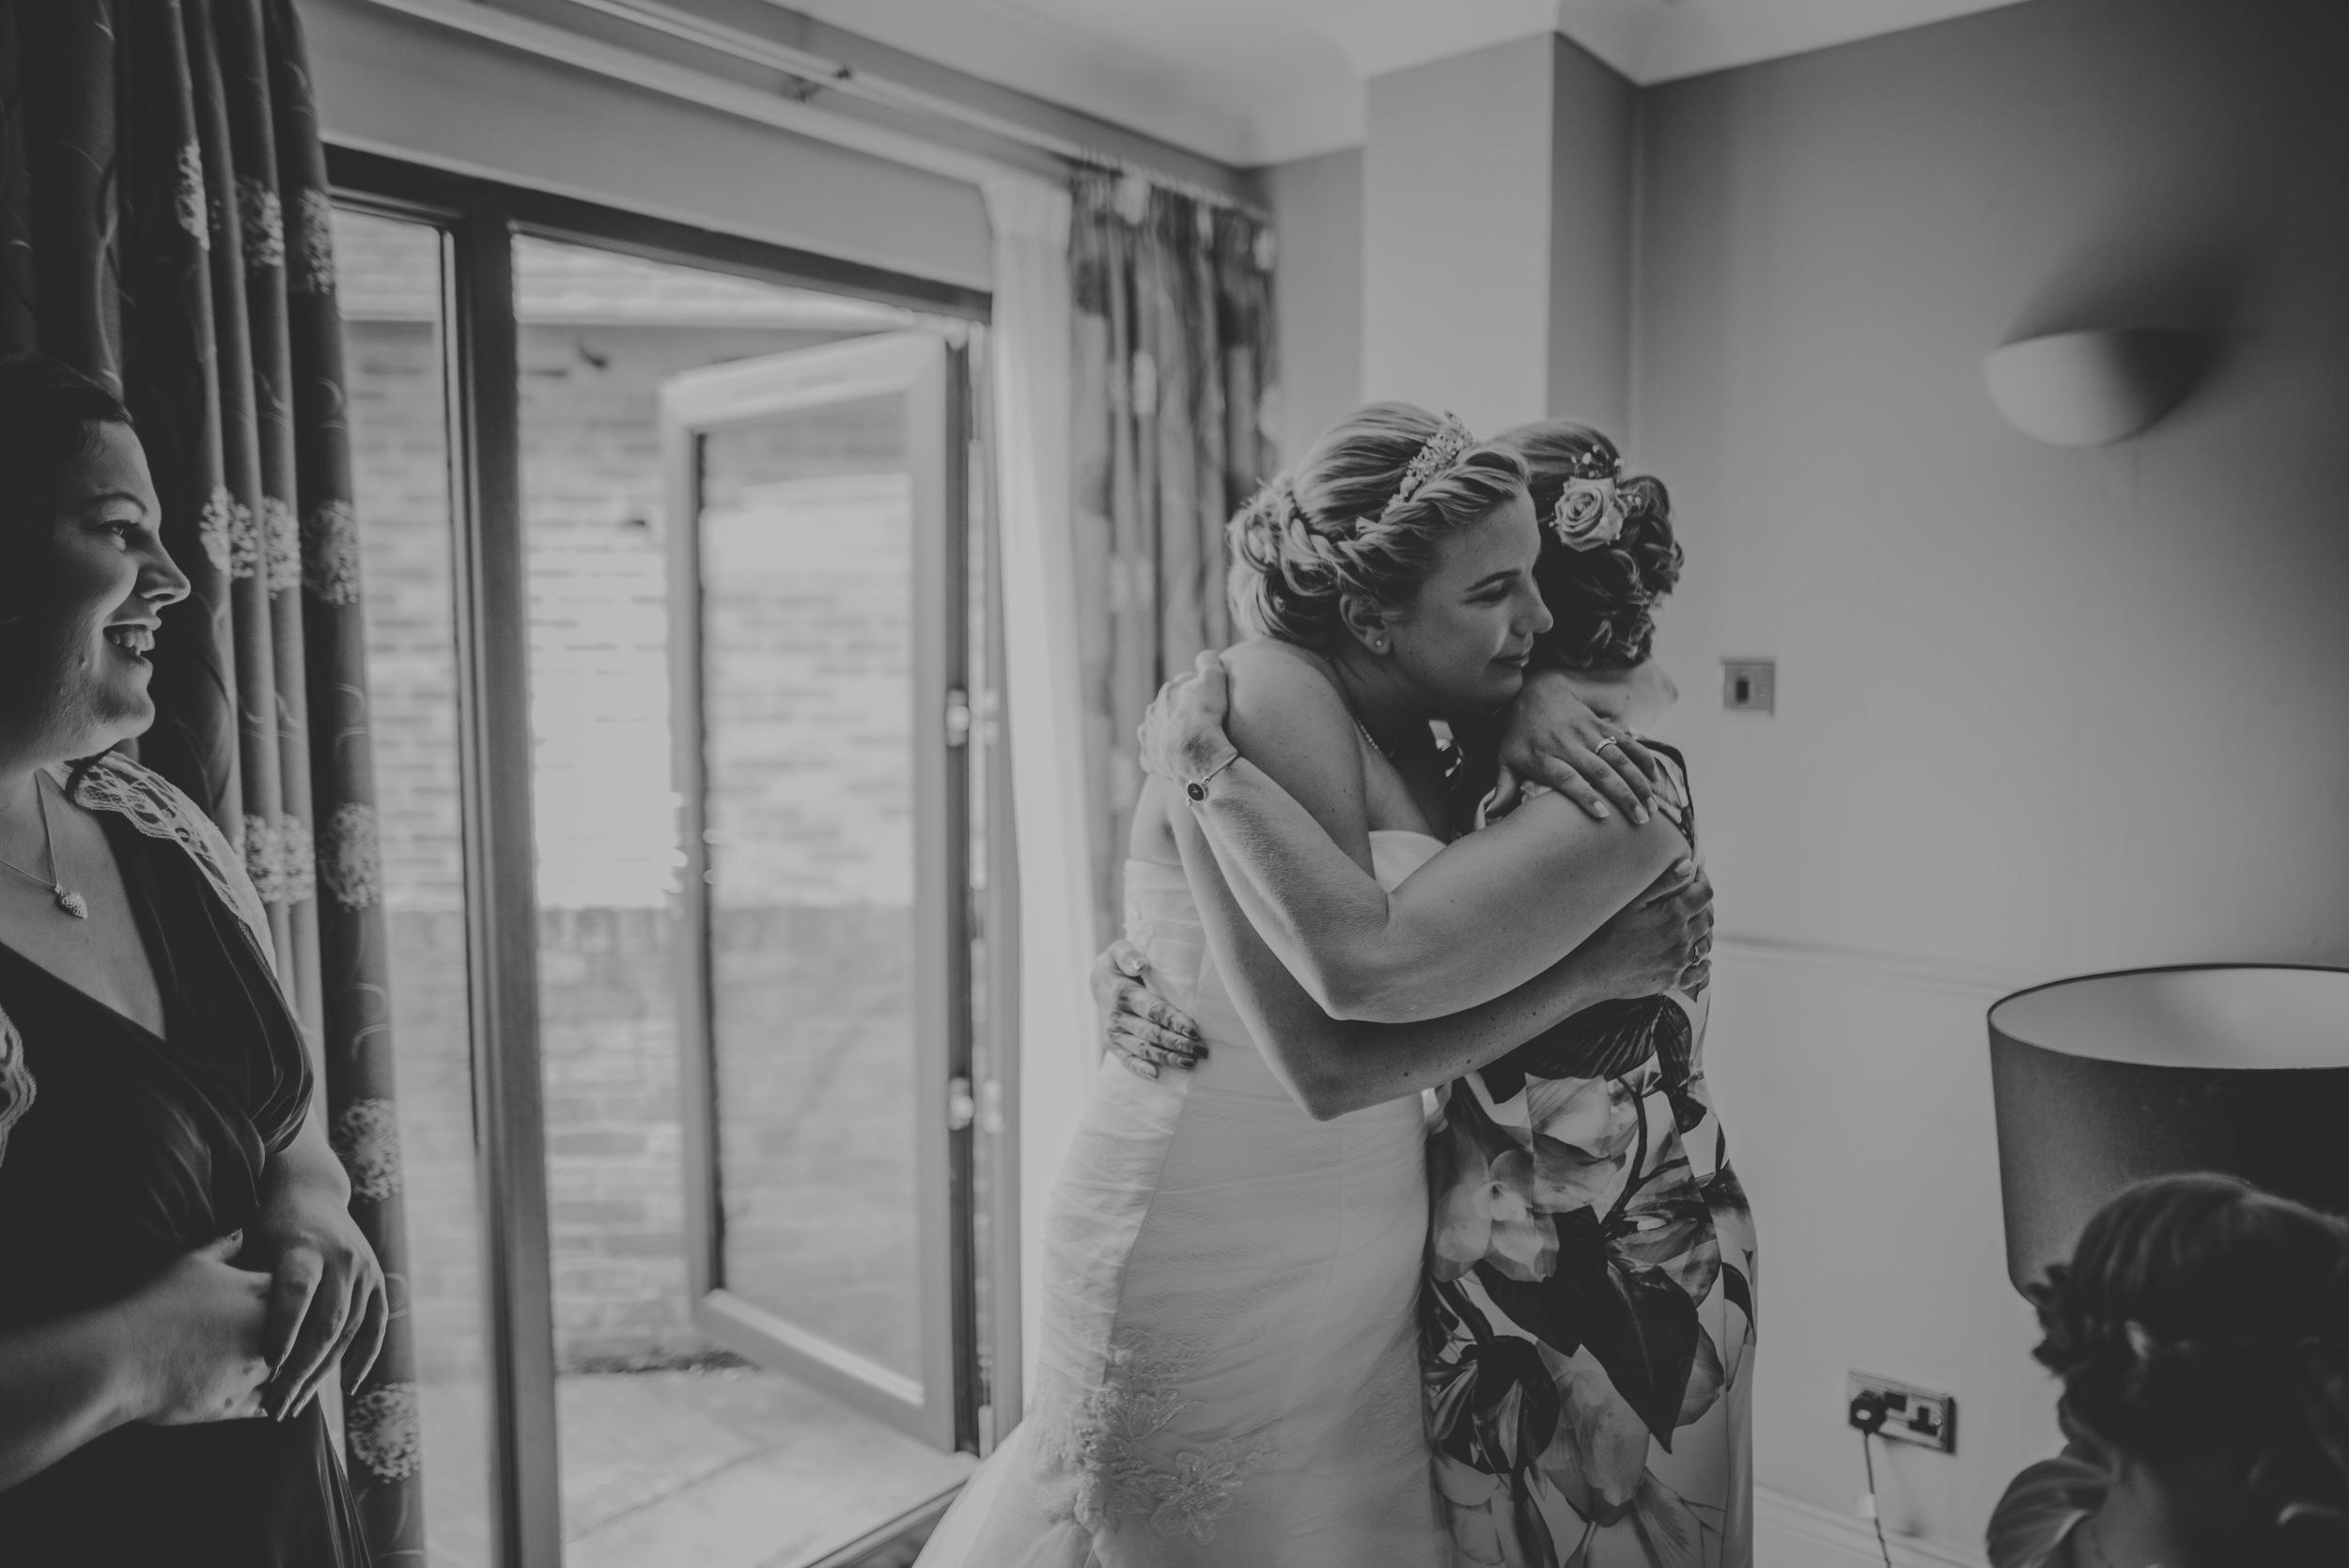 Chantelle-and-Stephen-Old-Thorns-Hotel-Wedding-Liphook-Manu-Mendoza-Wedding-Photography-129.jpg